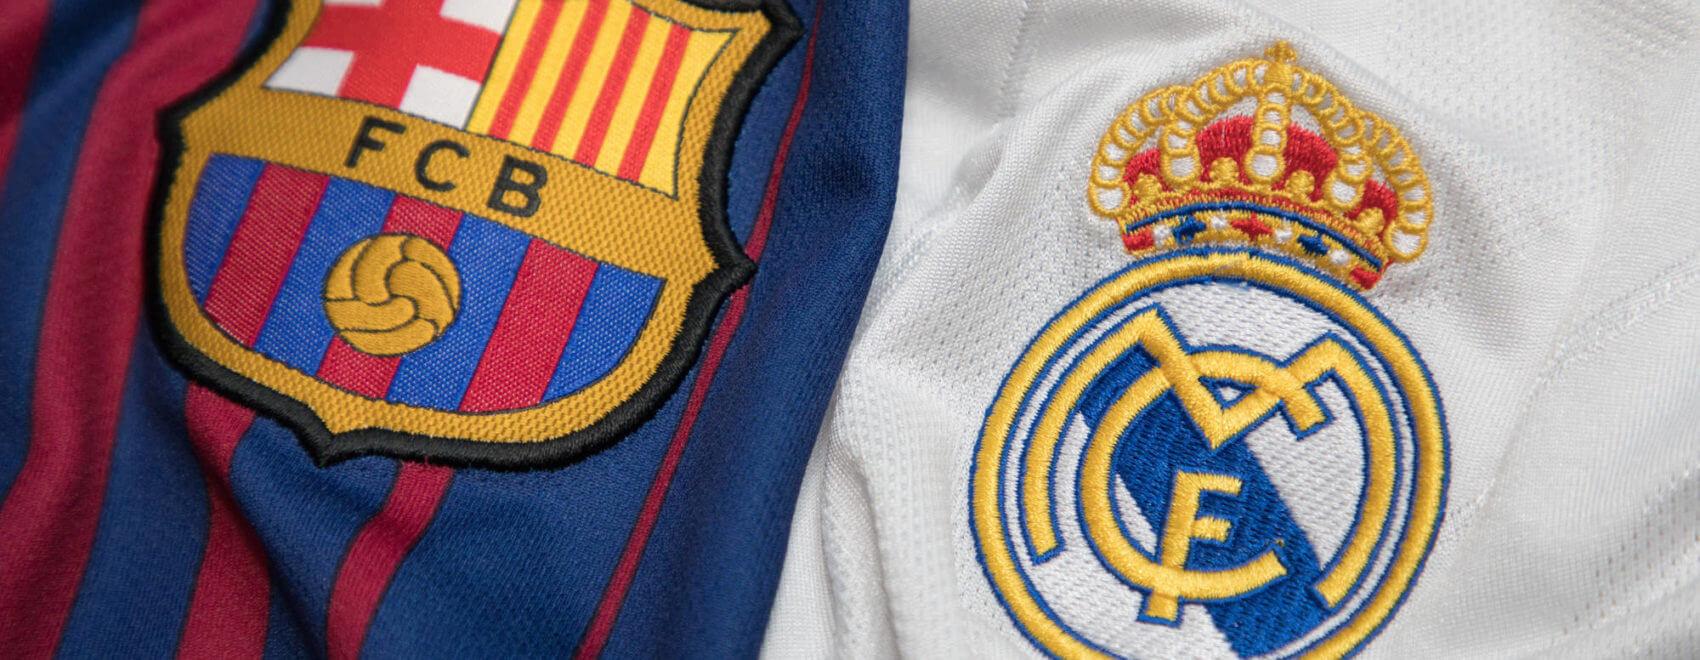 El Clasico: FC Barcelona - Real Madrid